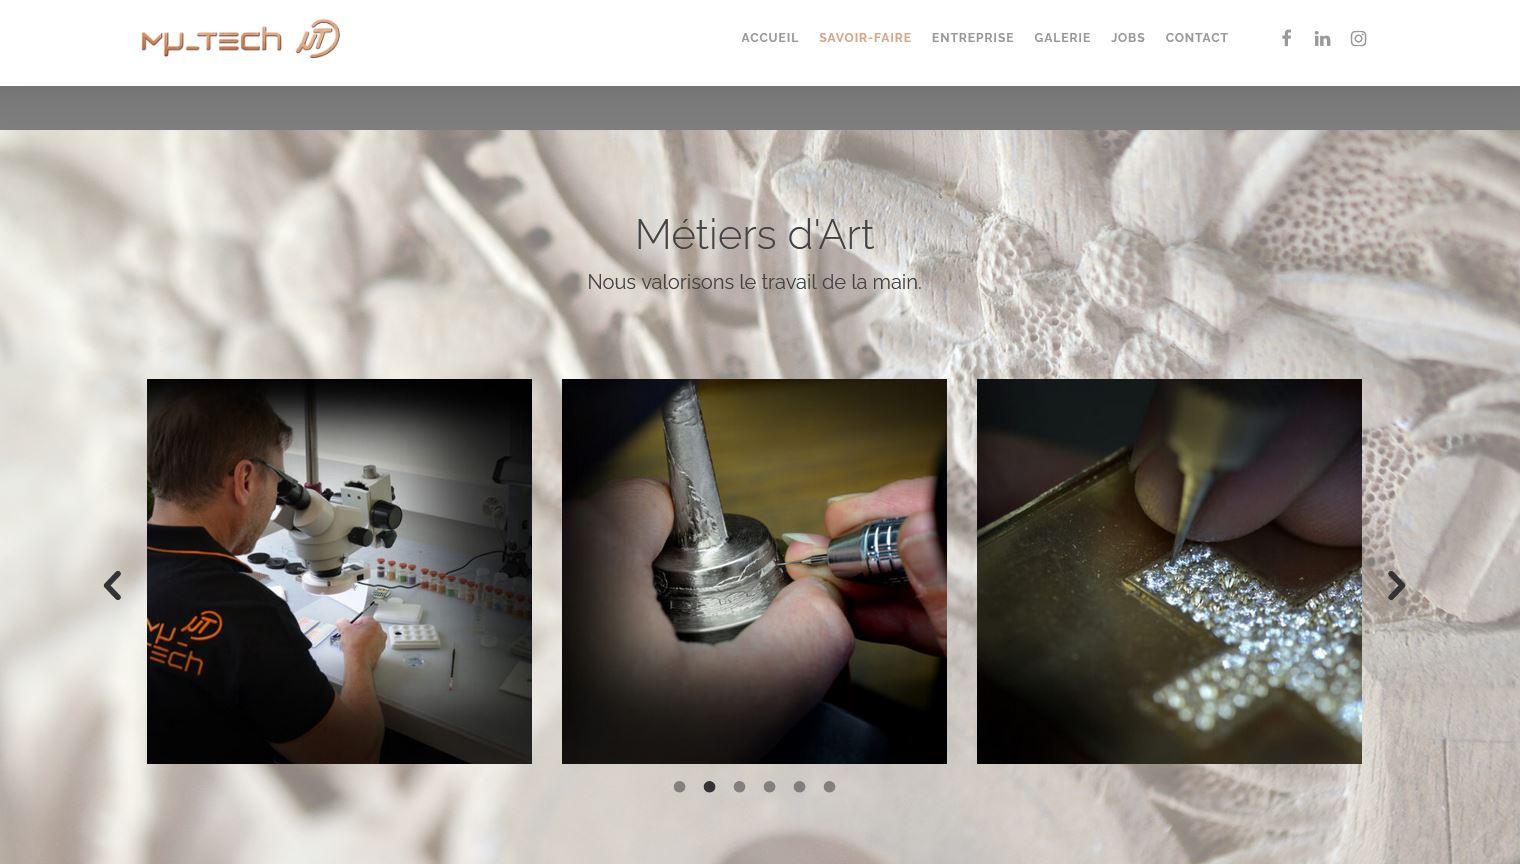 Horlogerie - Mu-Tech - Site internet - Page Gravure Métiers d'art